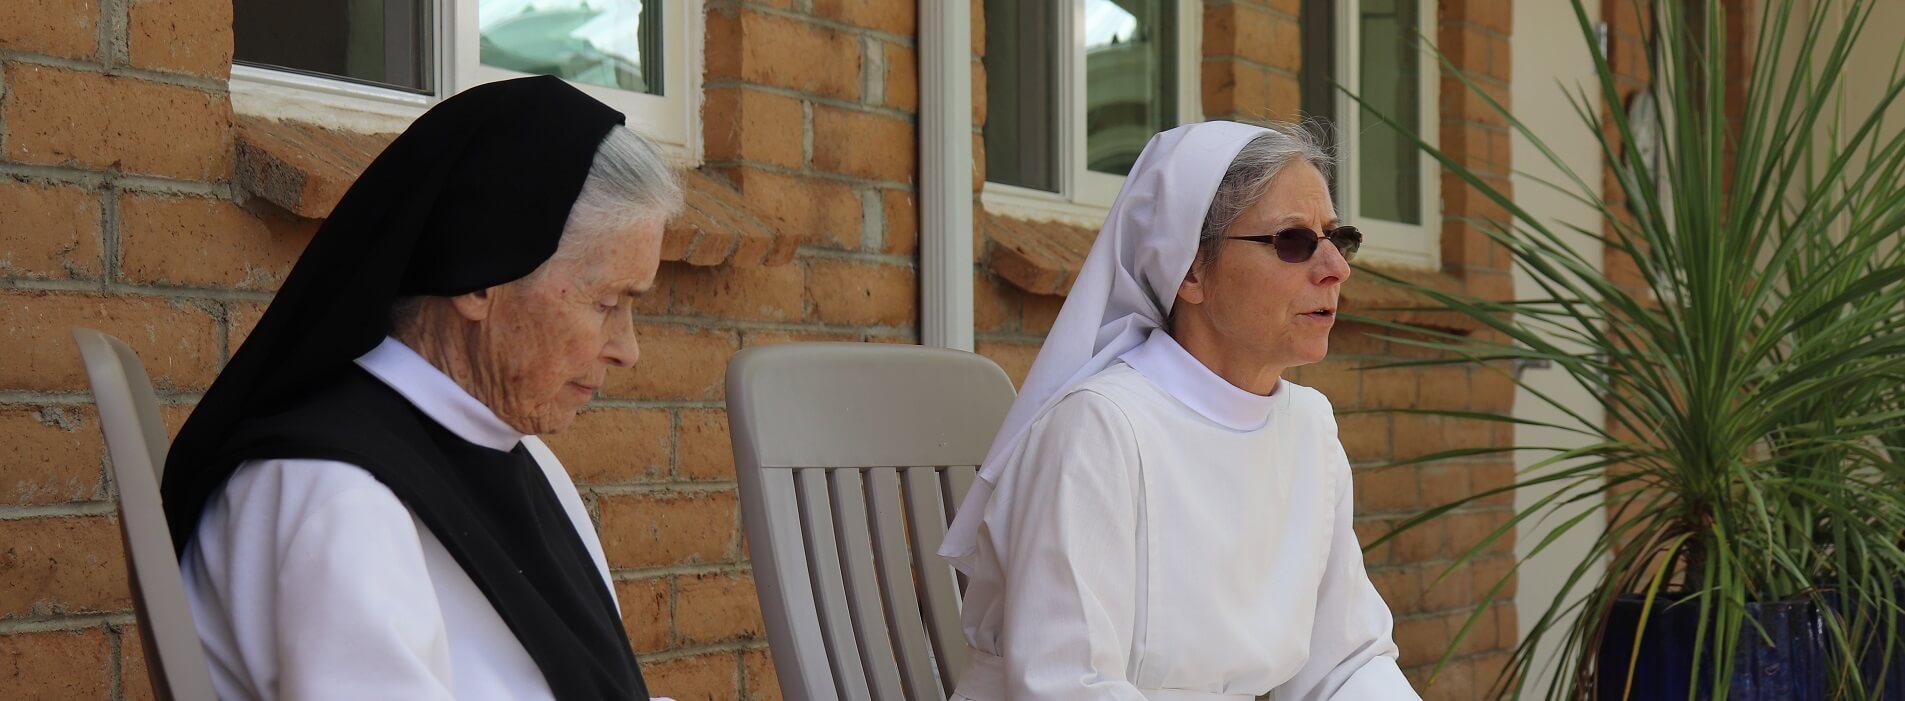 2021 09 26 sisters outside refectory